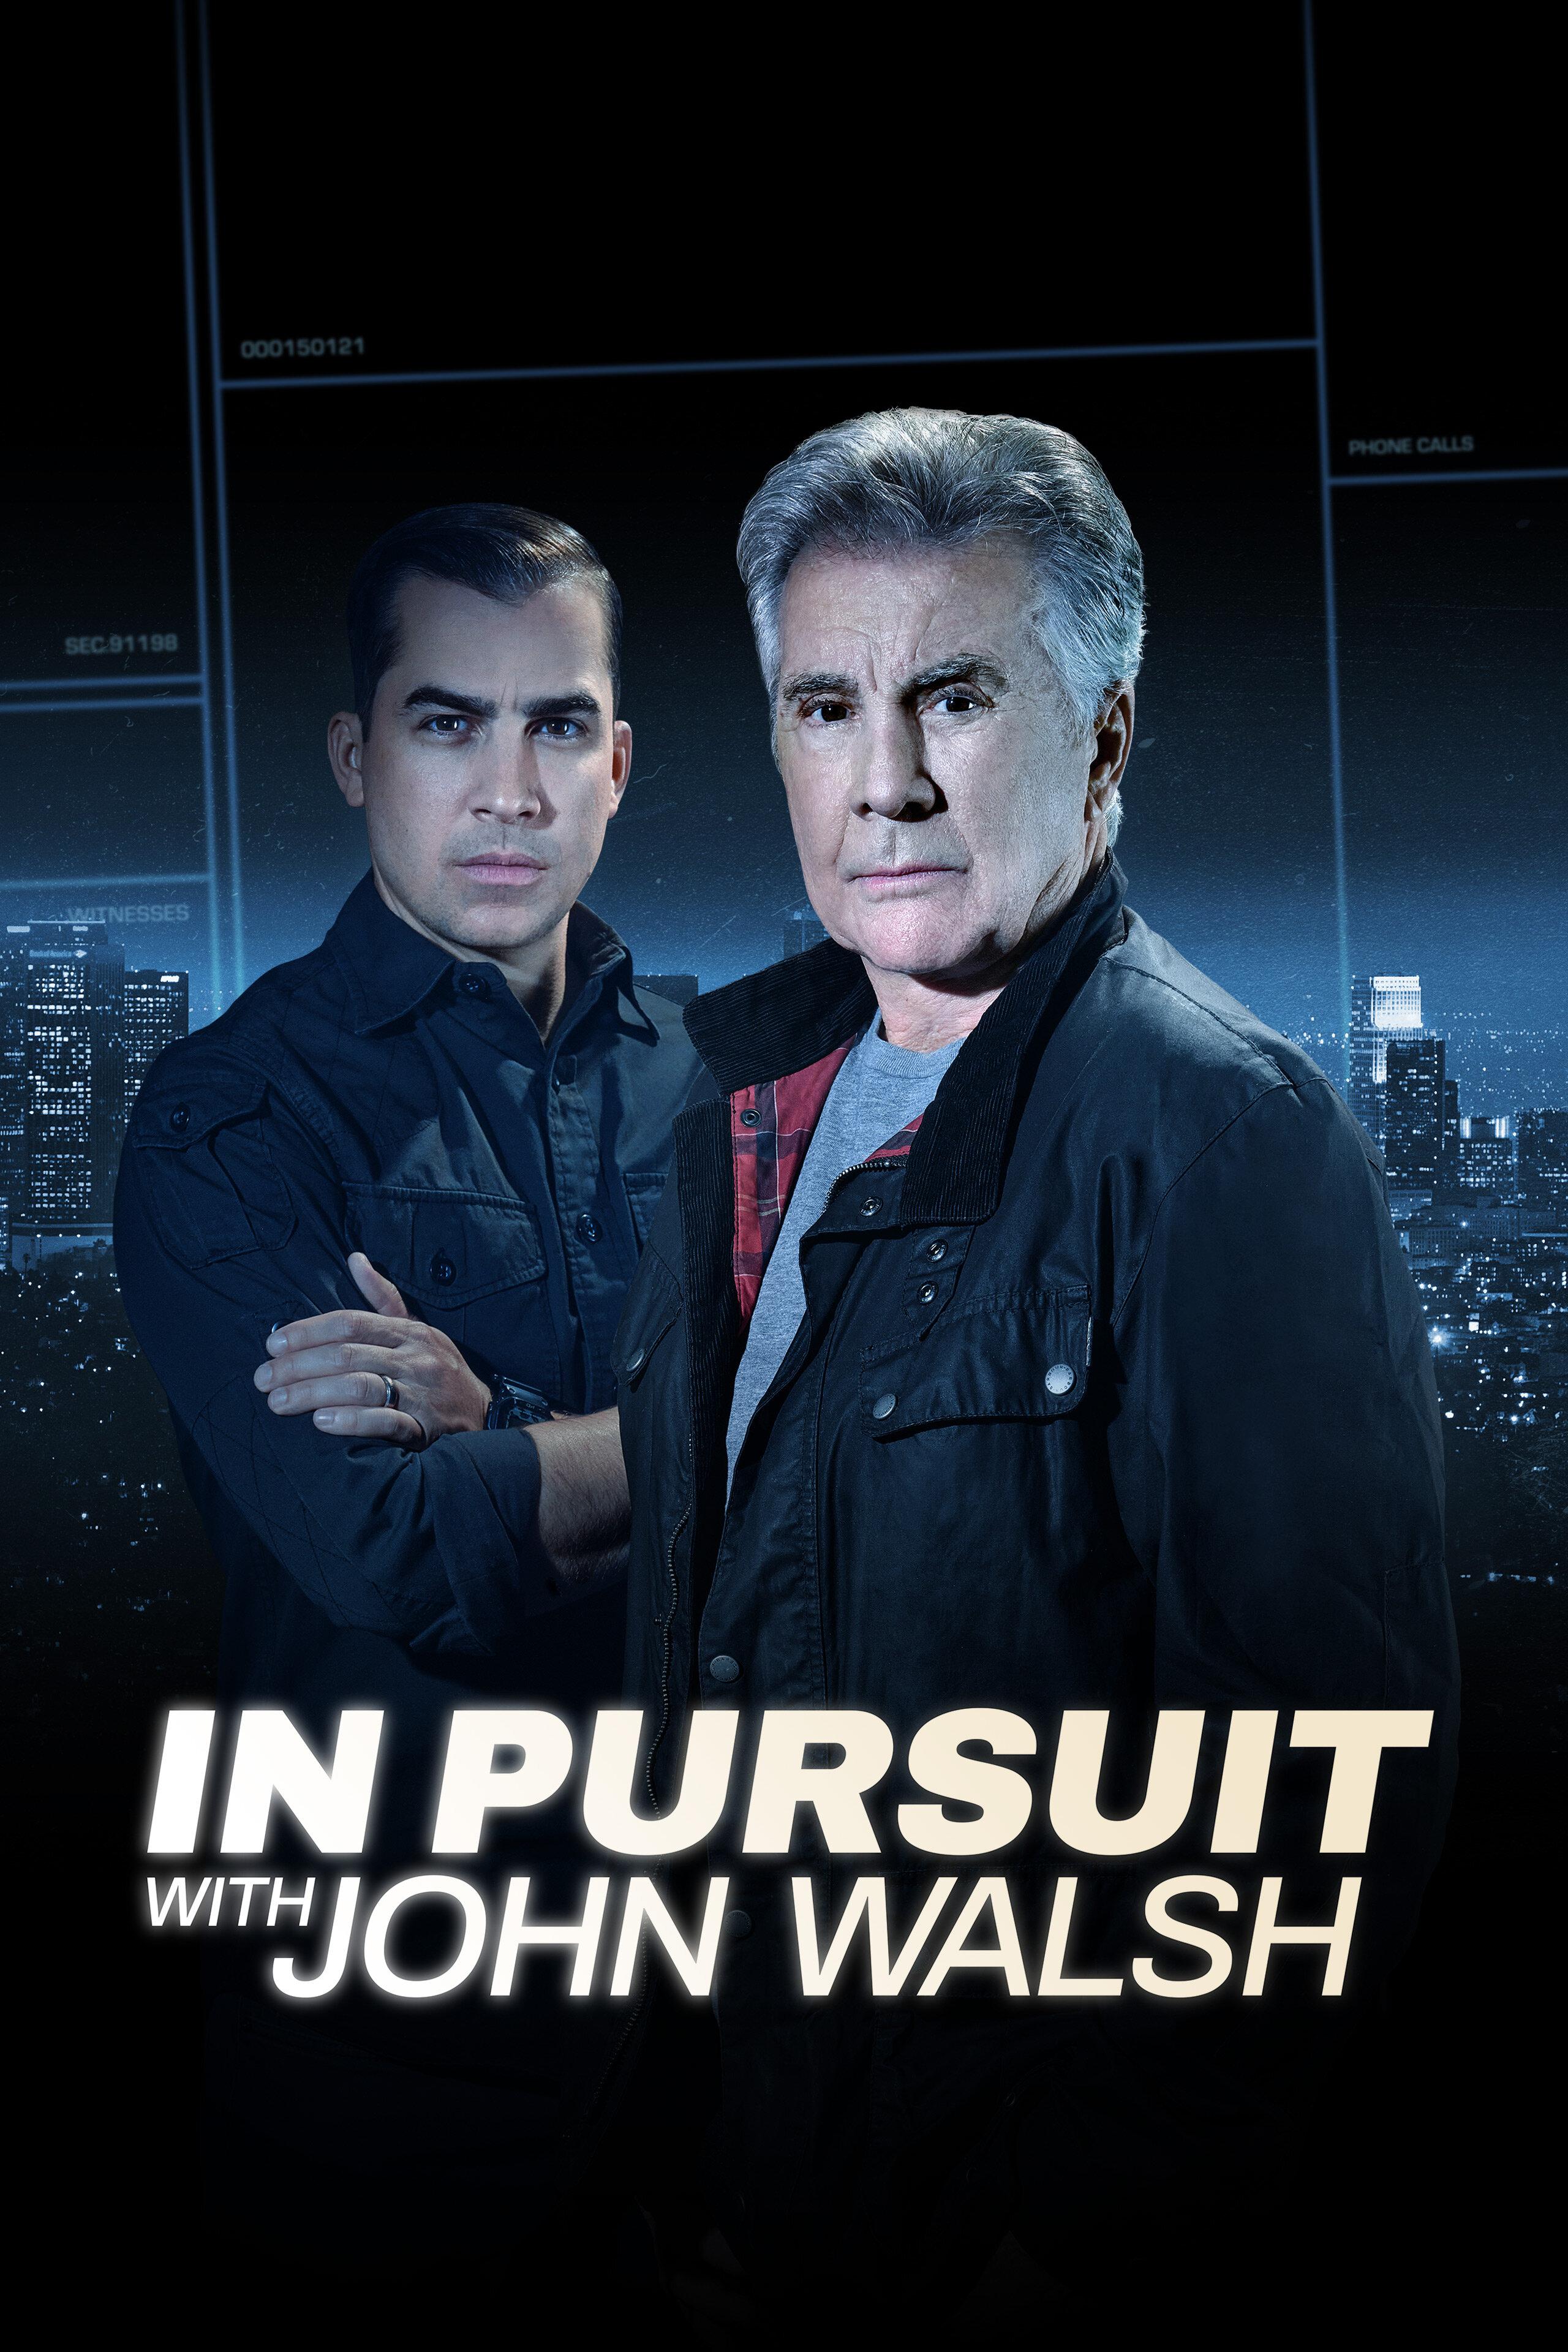 In Pursuit with John Walsh ne zaman